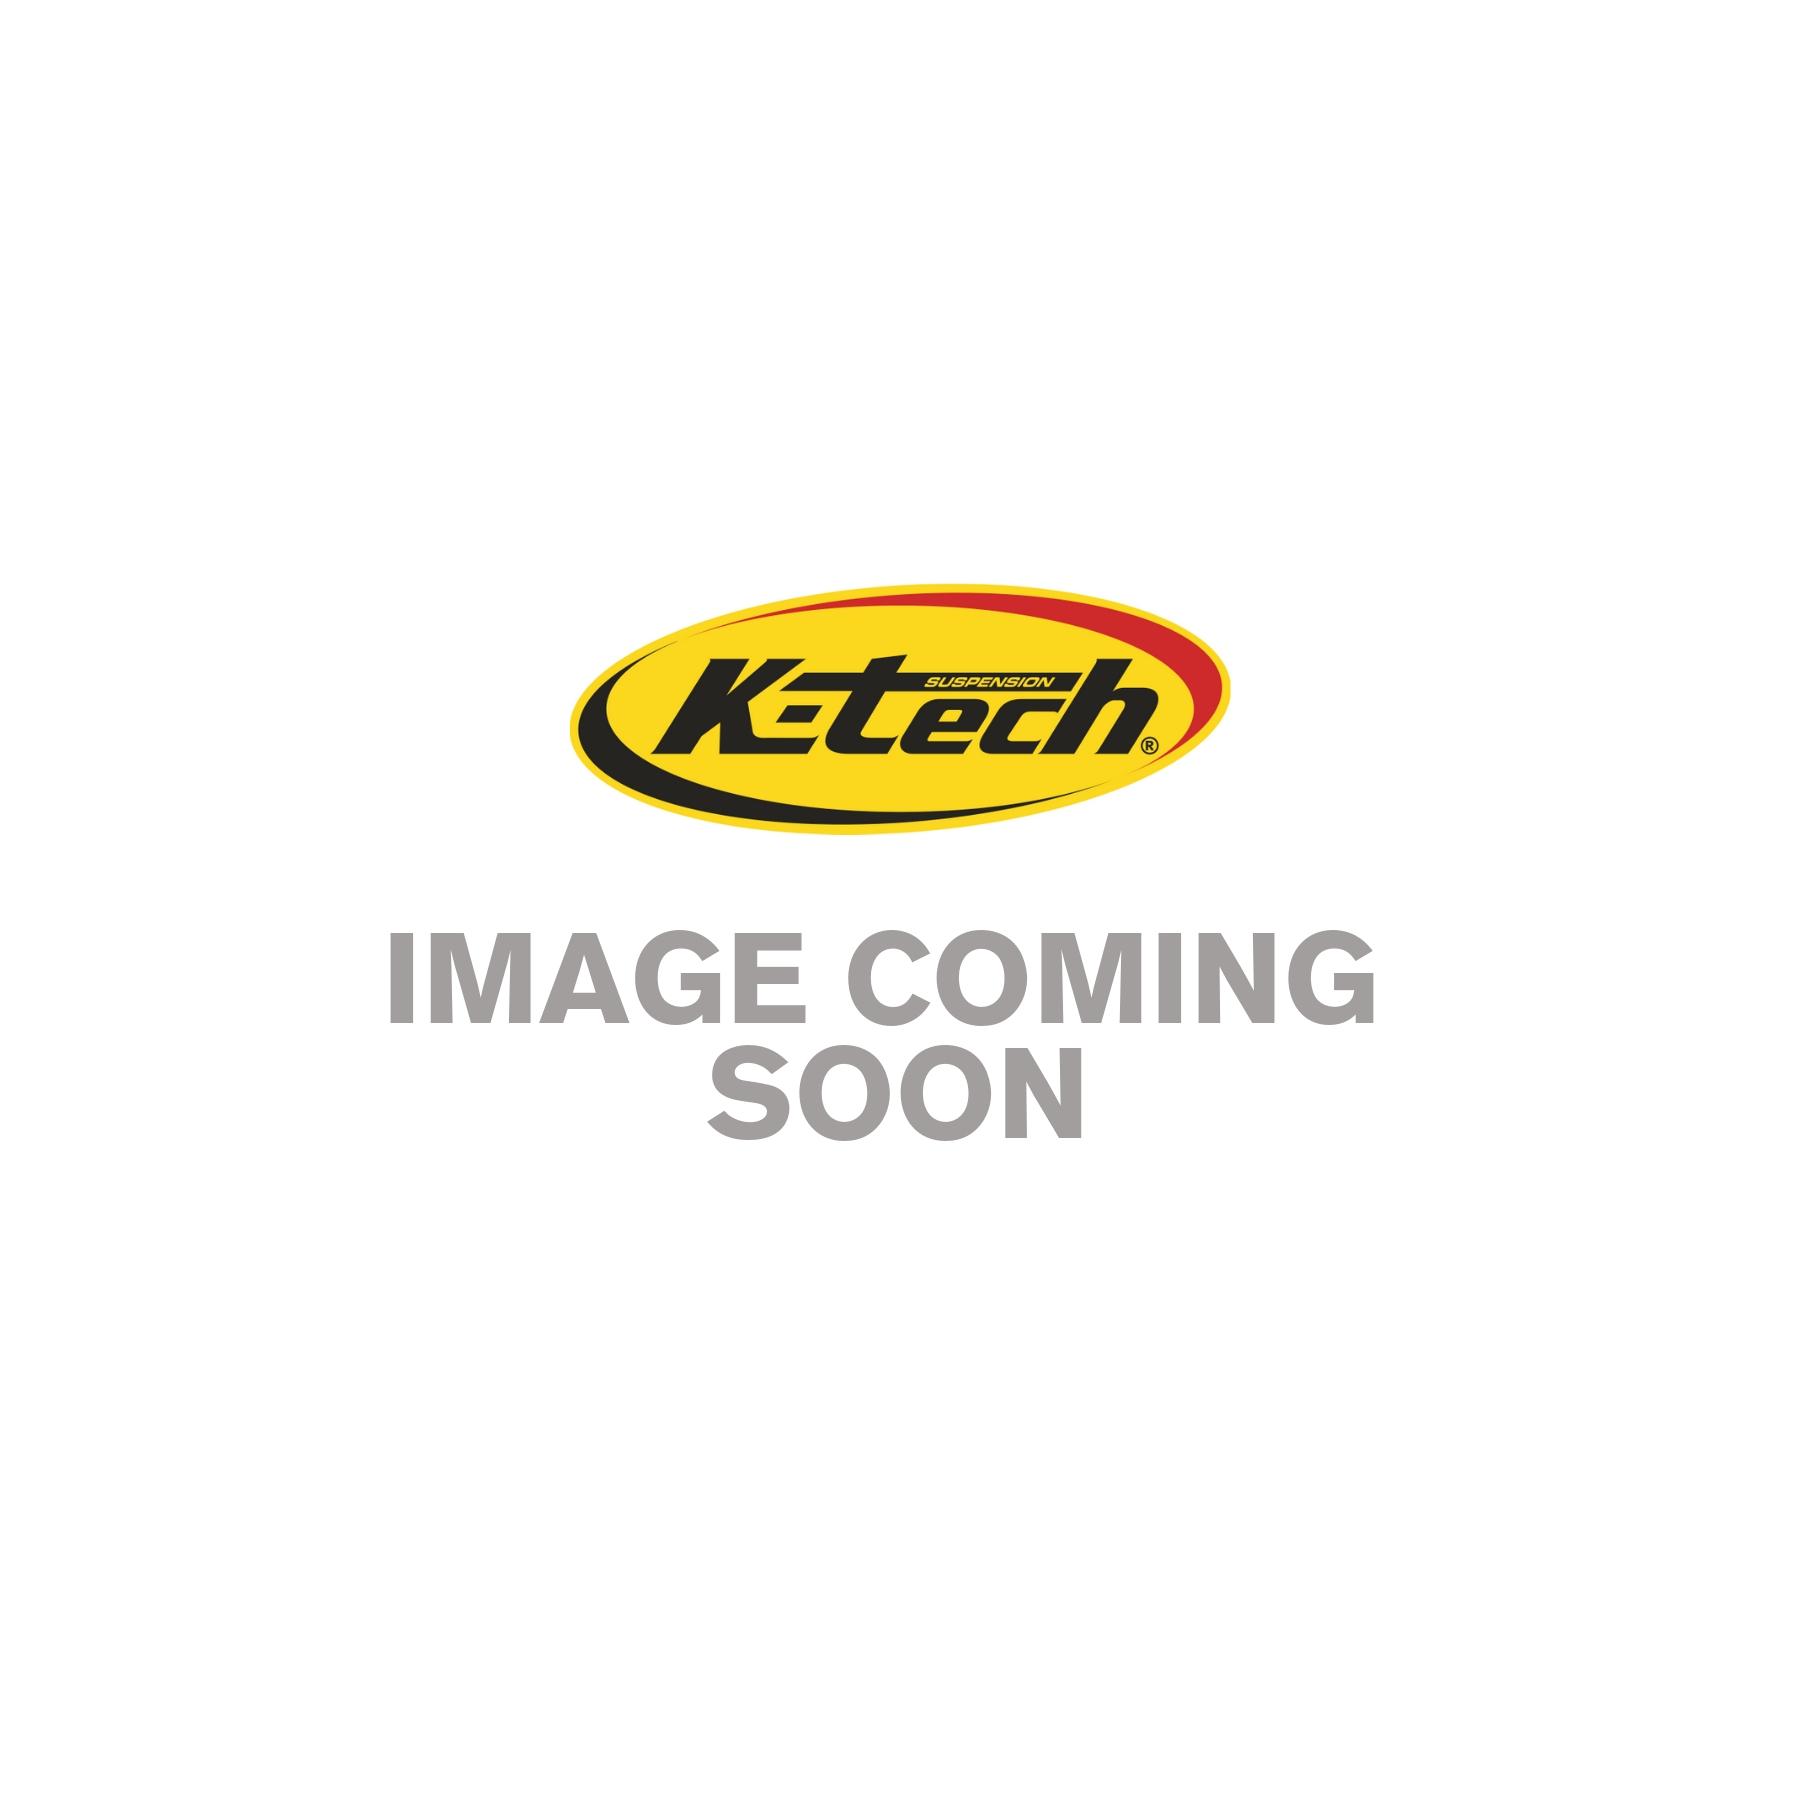 RDS Front Fork Cartridges Kawasaki ZX-10R 2011-2015 Showa BPF